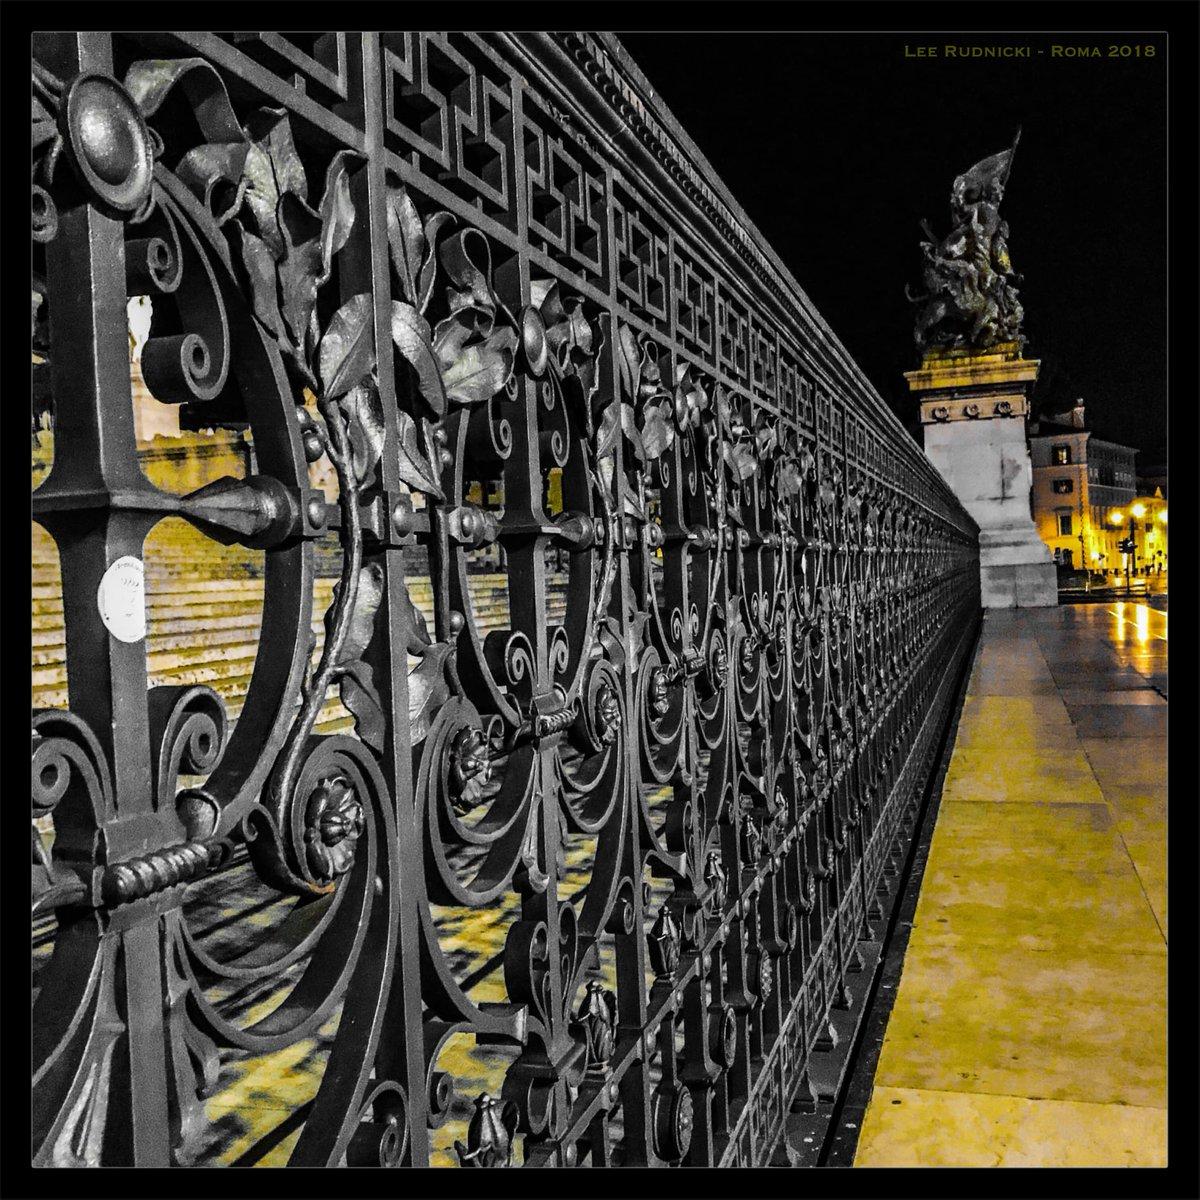 Roma Scene 7 #leerudnicki #photography #rome #roma #italy #italia #travel #ig #art #love  #picoftheday #igersroma #instagood #romeitaly #photooftheday #travelphotography #lazio #europe #igersitalia #paris #like #visitrome #instagram #history #photo #follow #travelgram #bhfyp https://t.co/PzUwsEcu7f